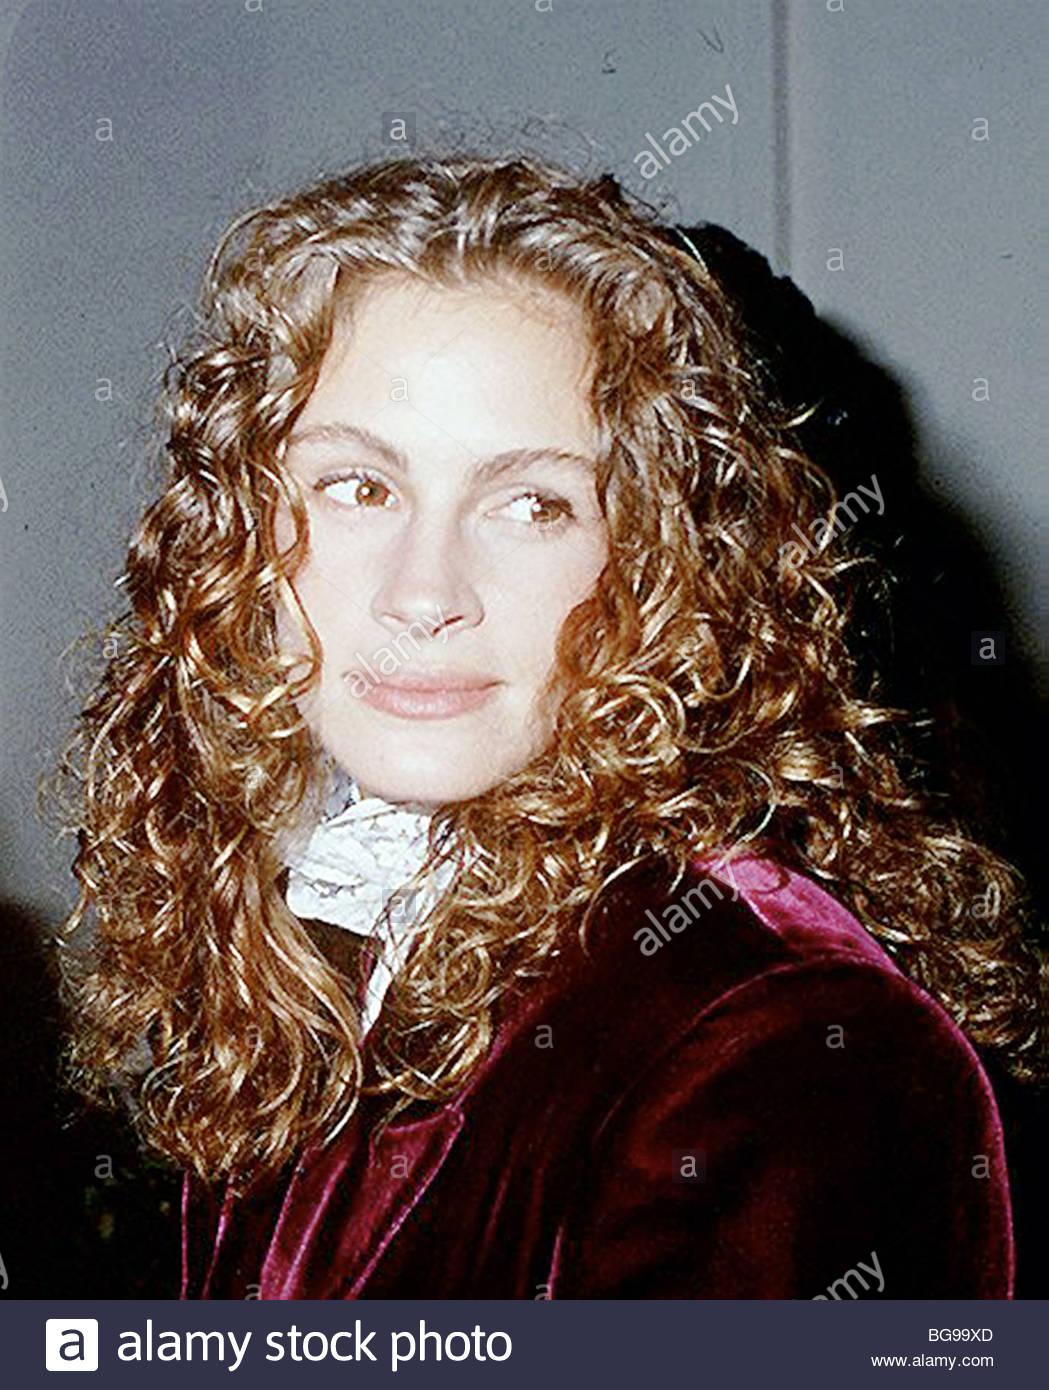 julia fiona roberts